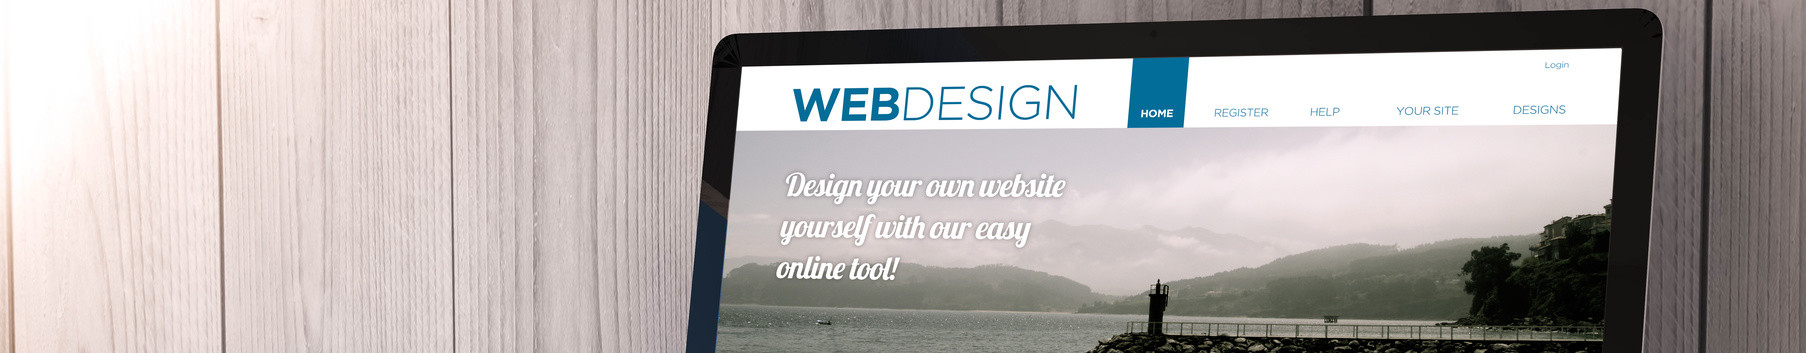 it-webdesign